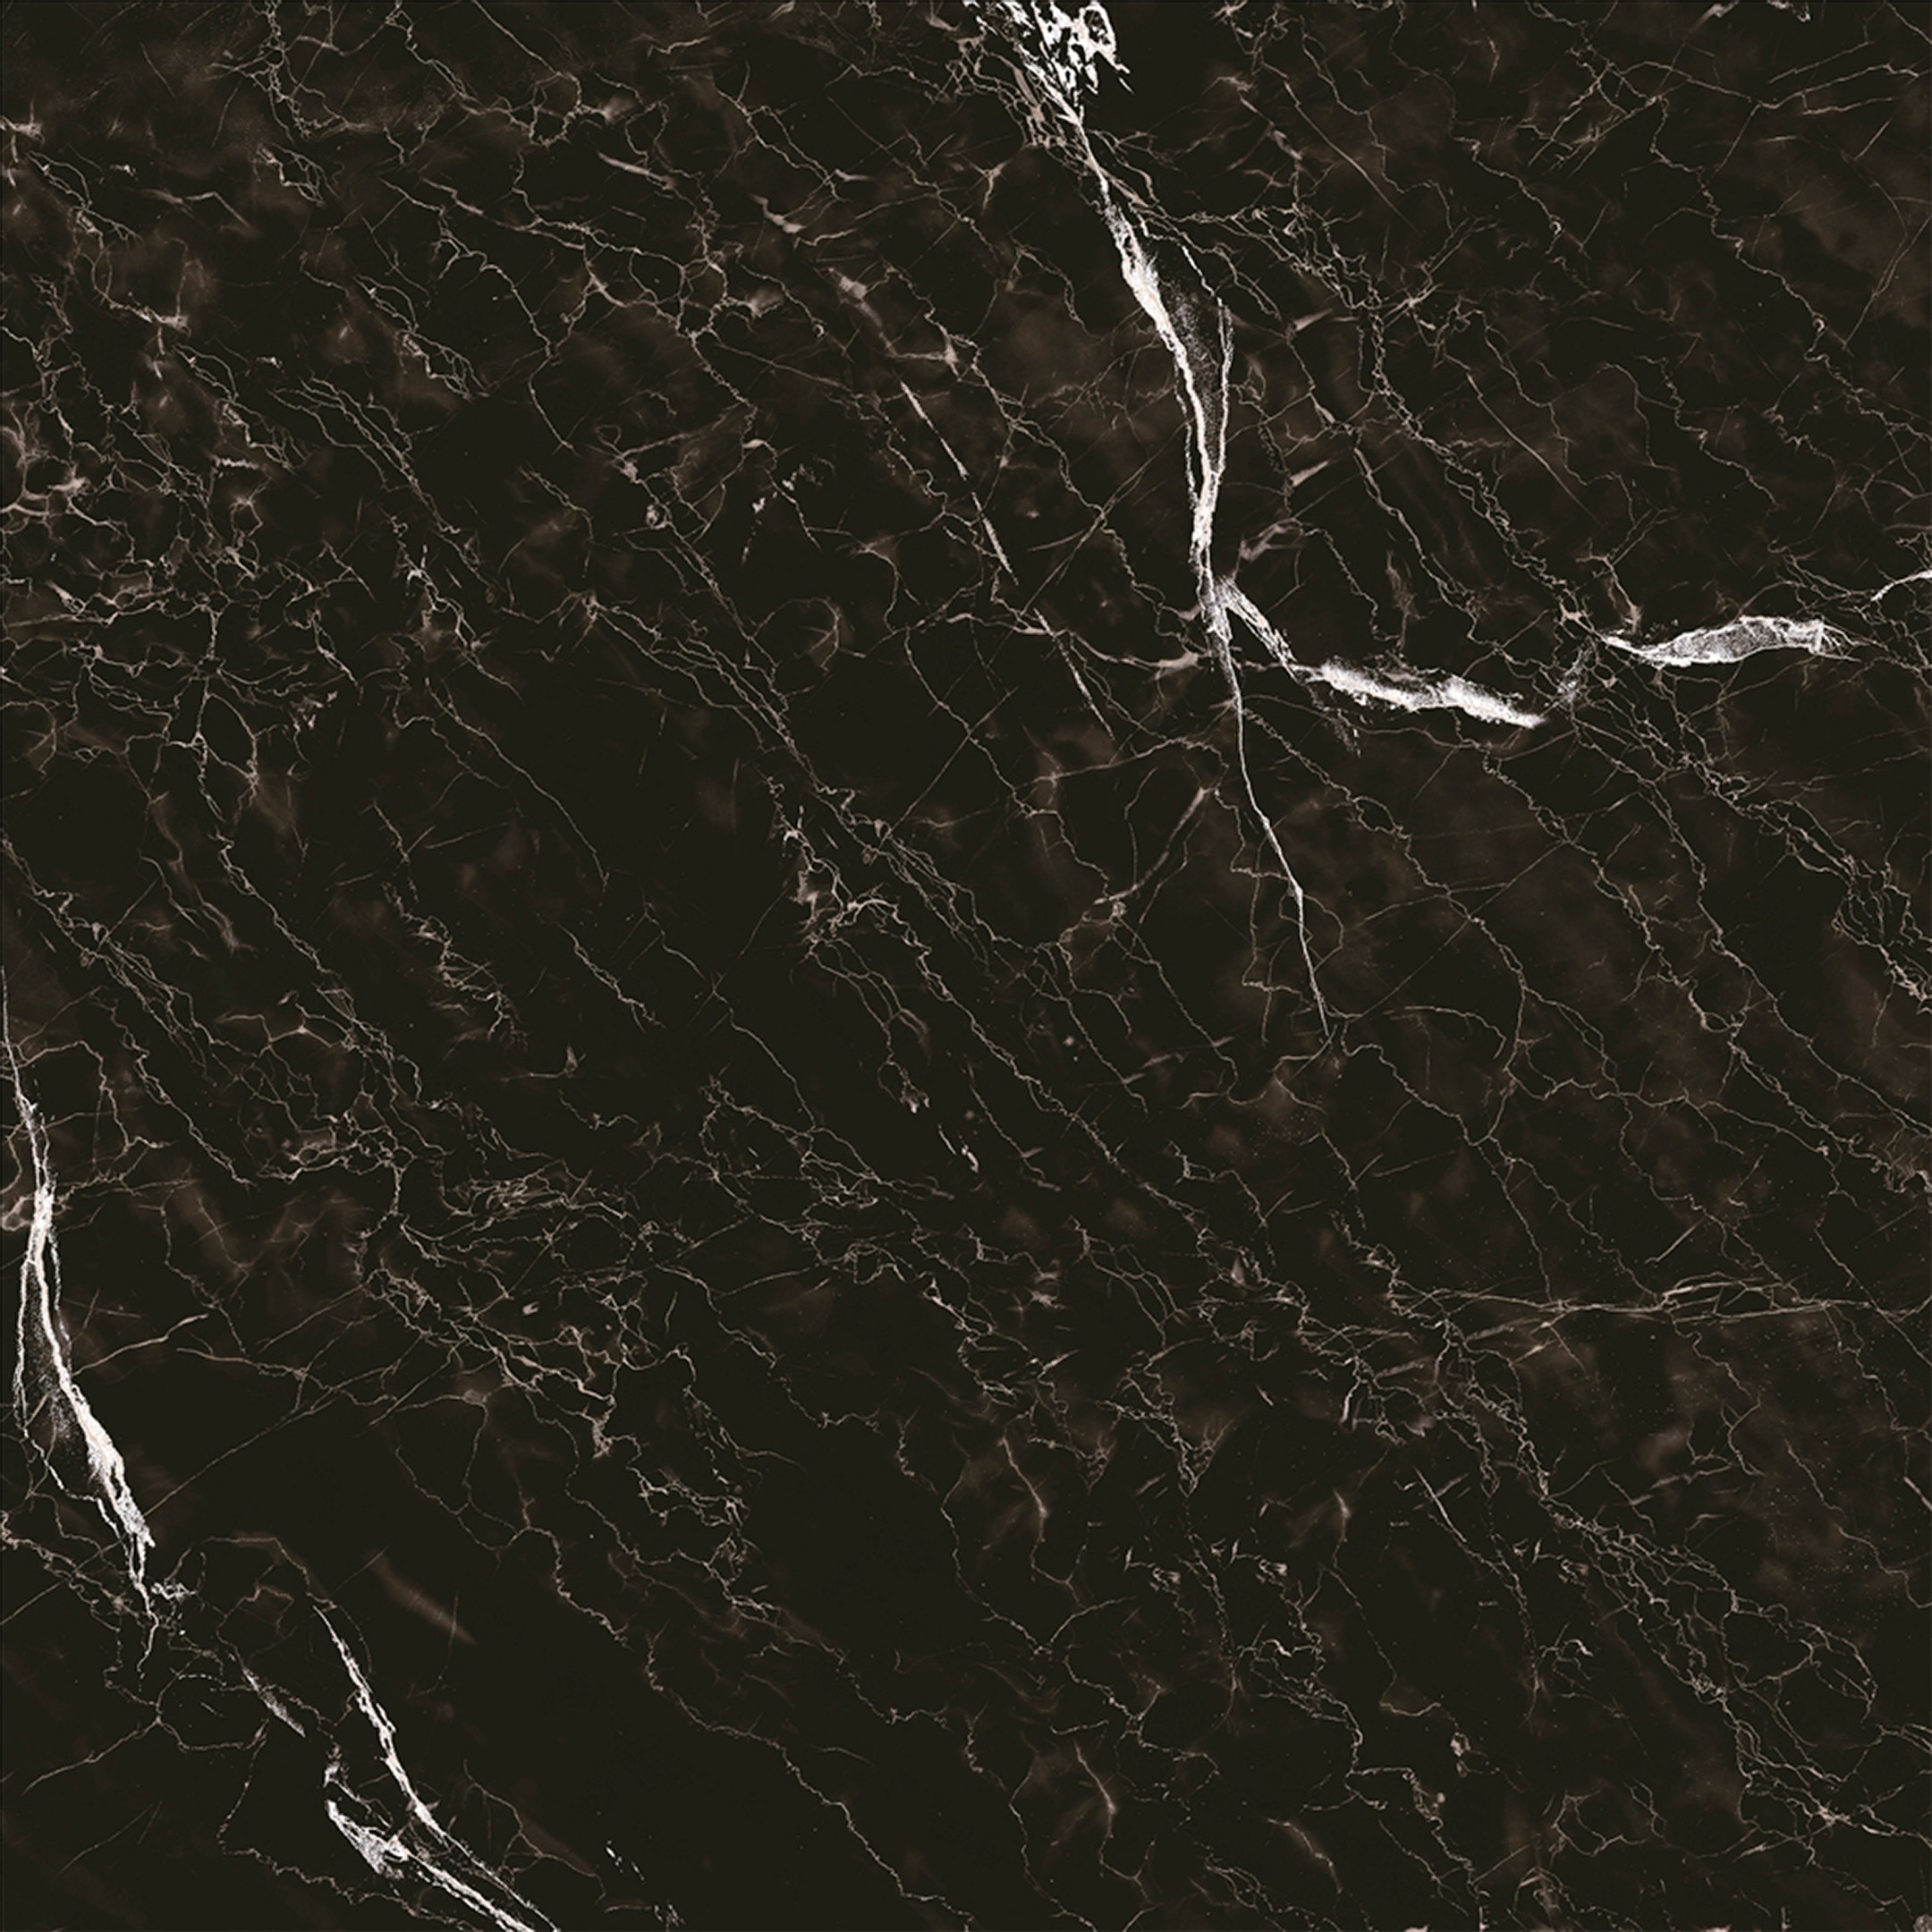 Керамогранит GRASARO Classic Marble черный 400х400х8 мм (10 шт.) grasaro marble classic snow white gt 270 d02 40x40